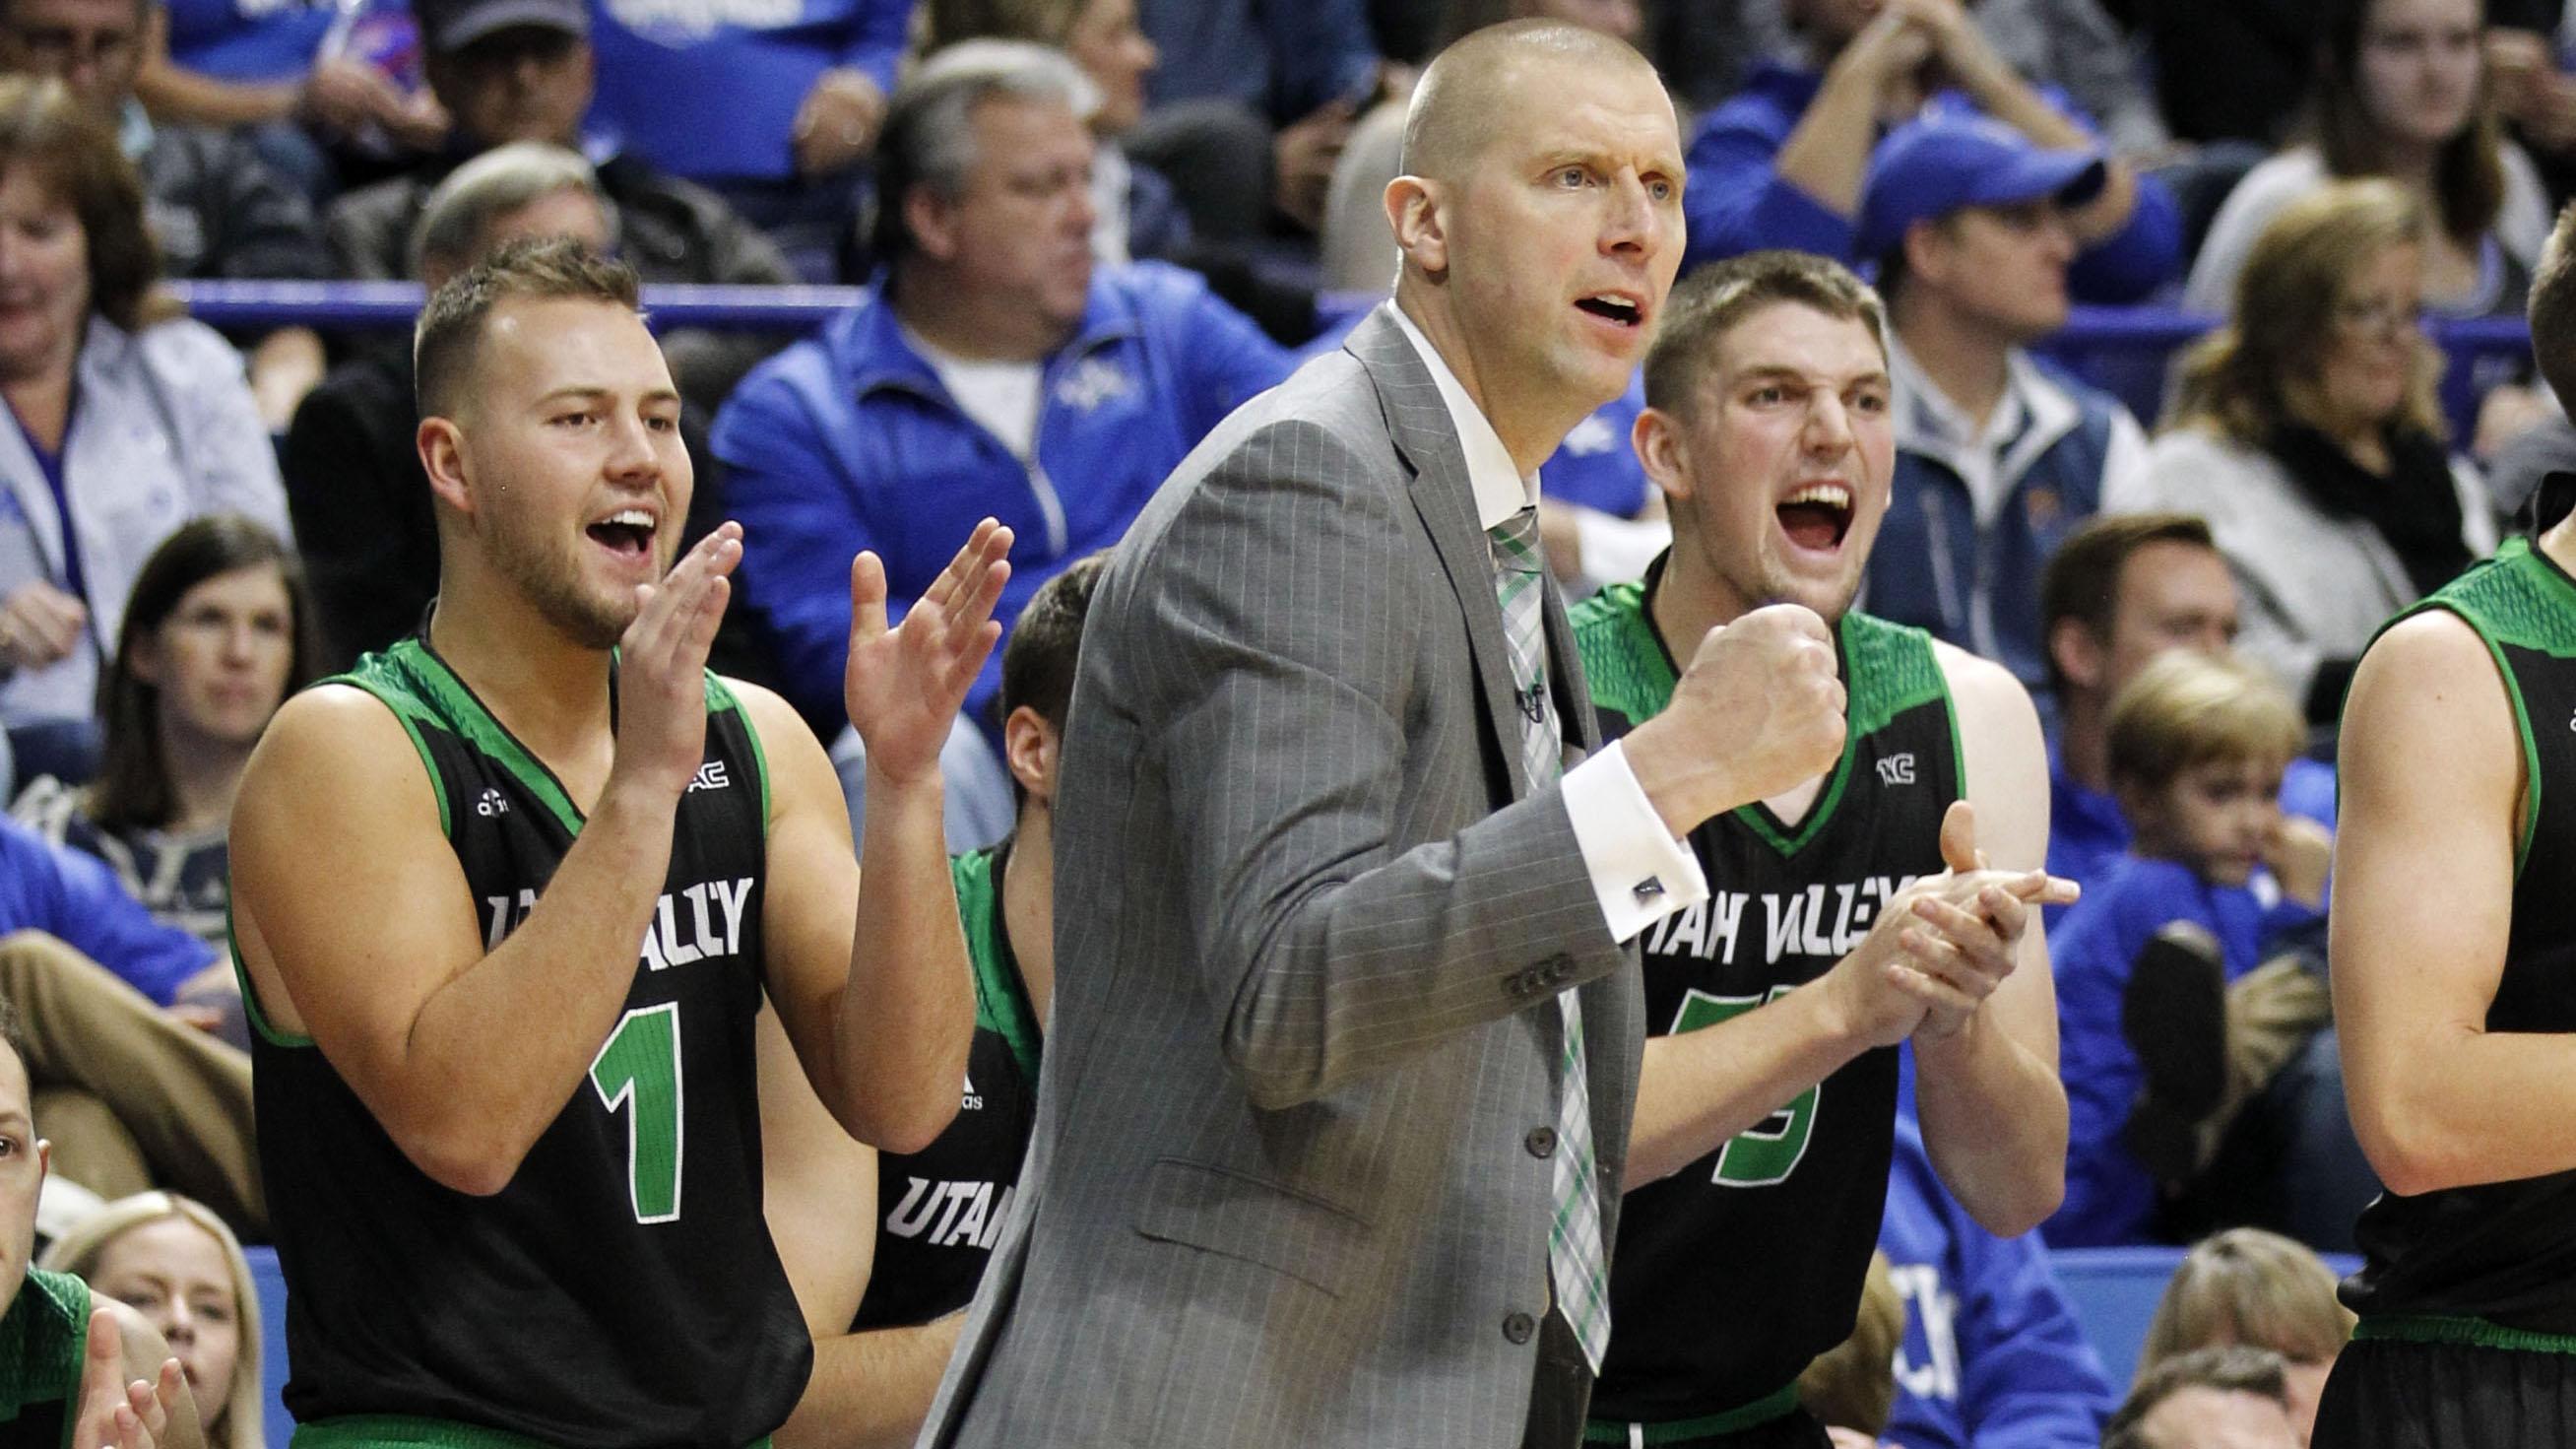 Utah Valley basketball celebrates